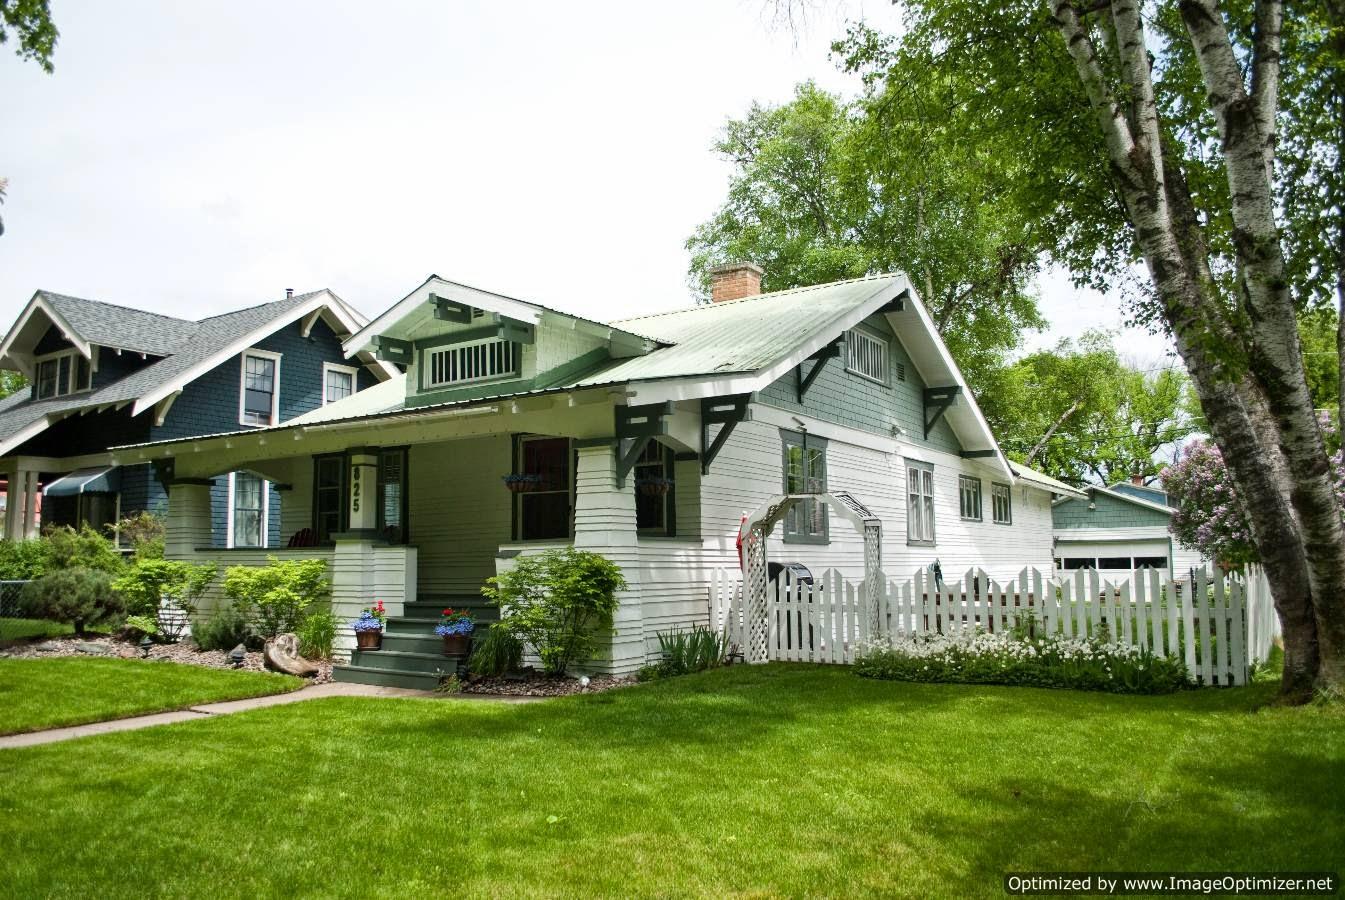 Kalispell Eastside Home For Sale: May 2014